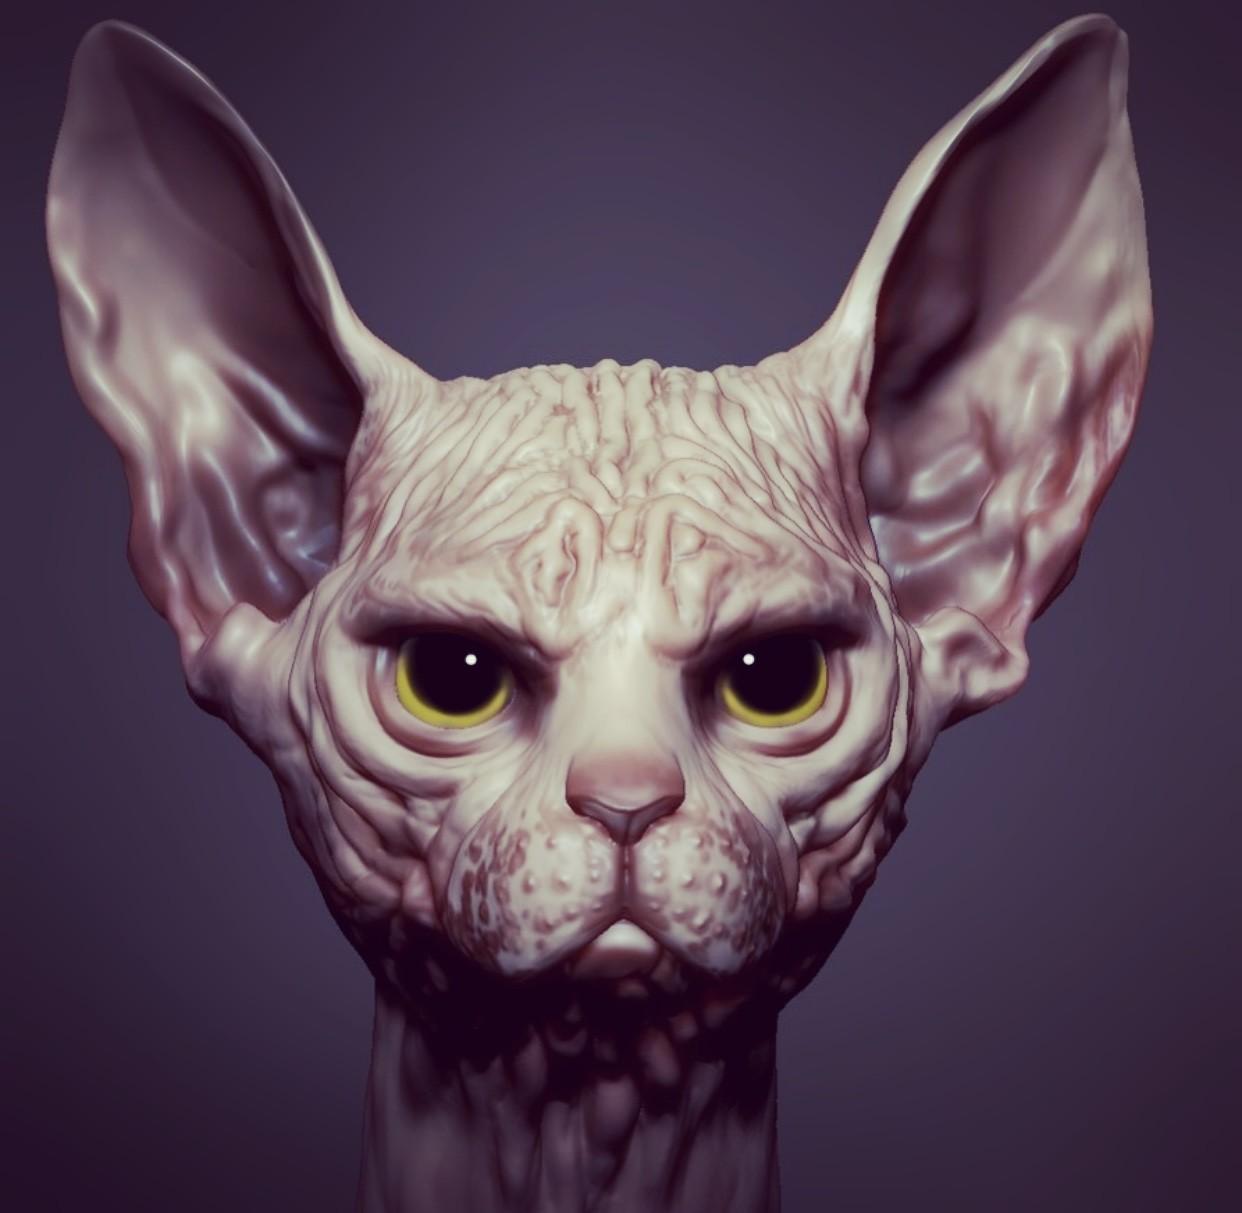 Taking up the sculptityourself Feline challenge by Rafael Grassetti -WIP